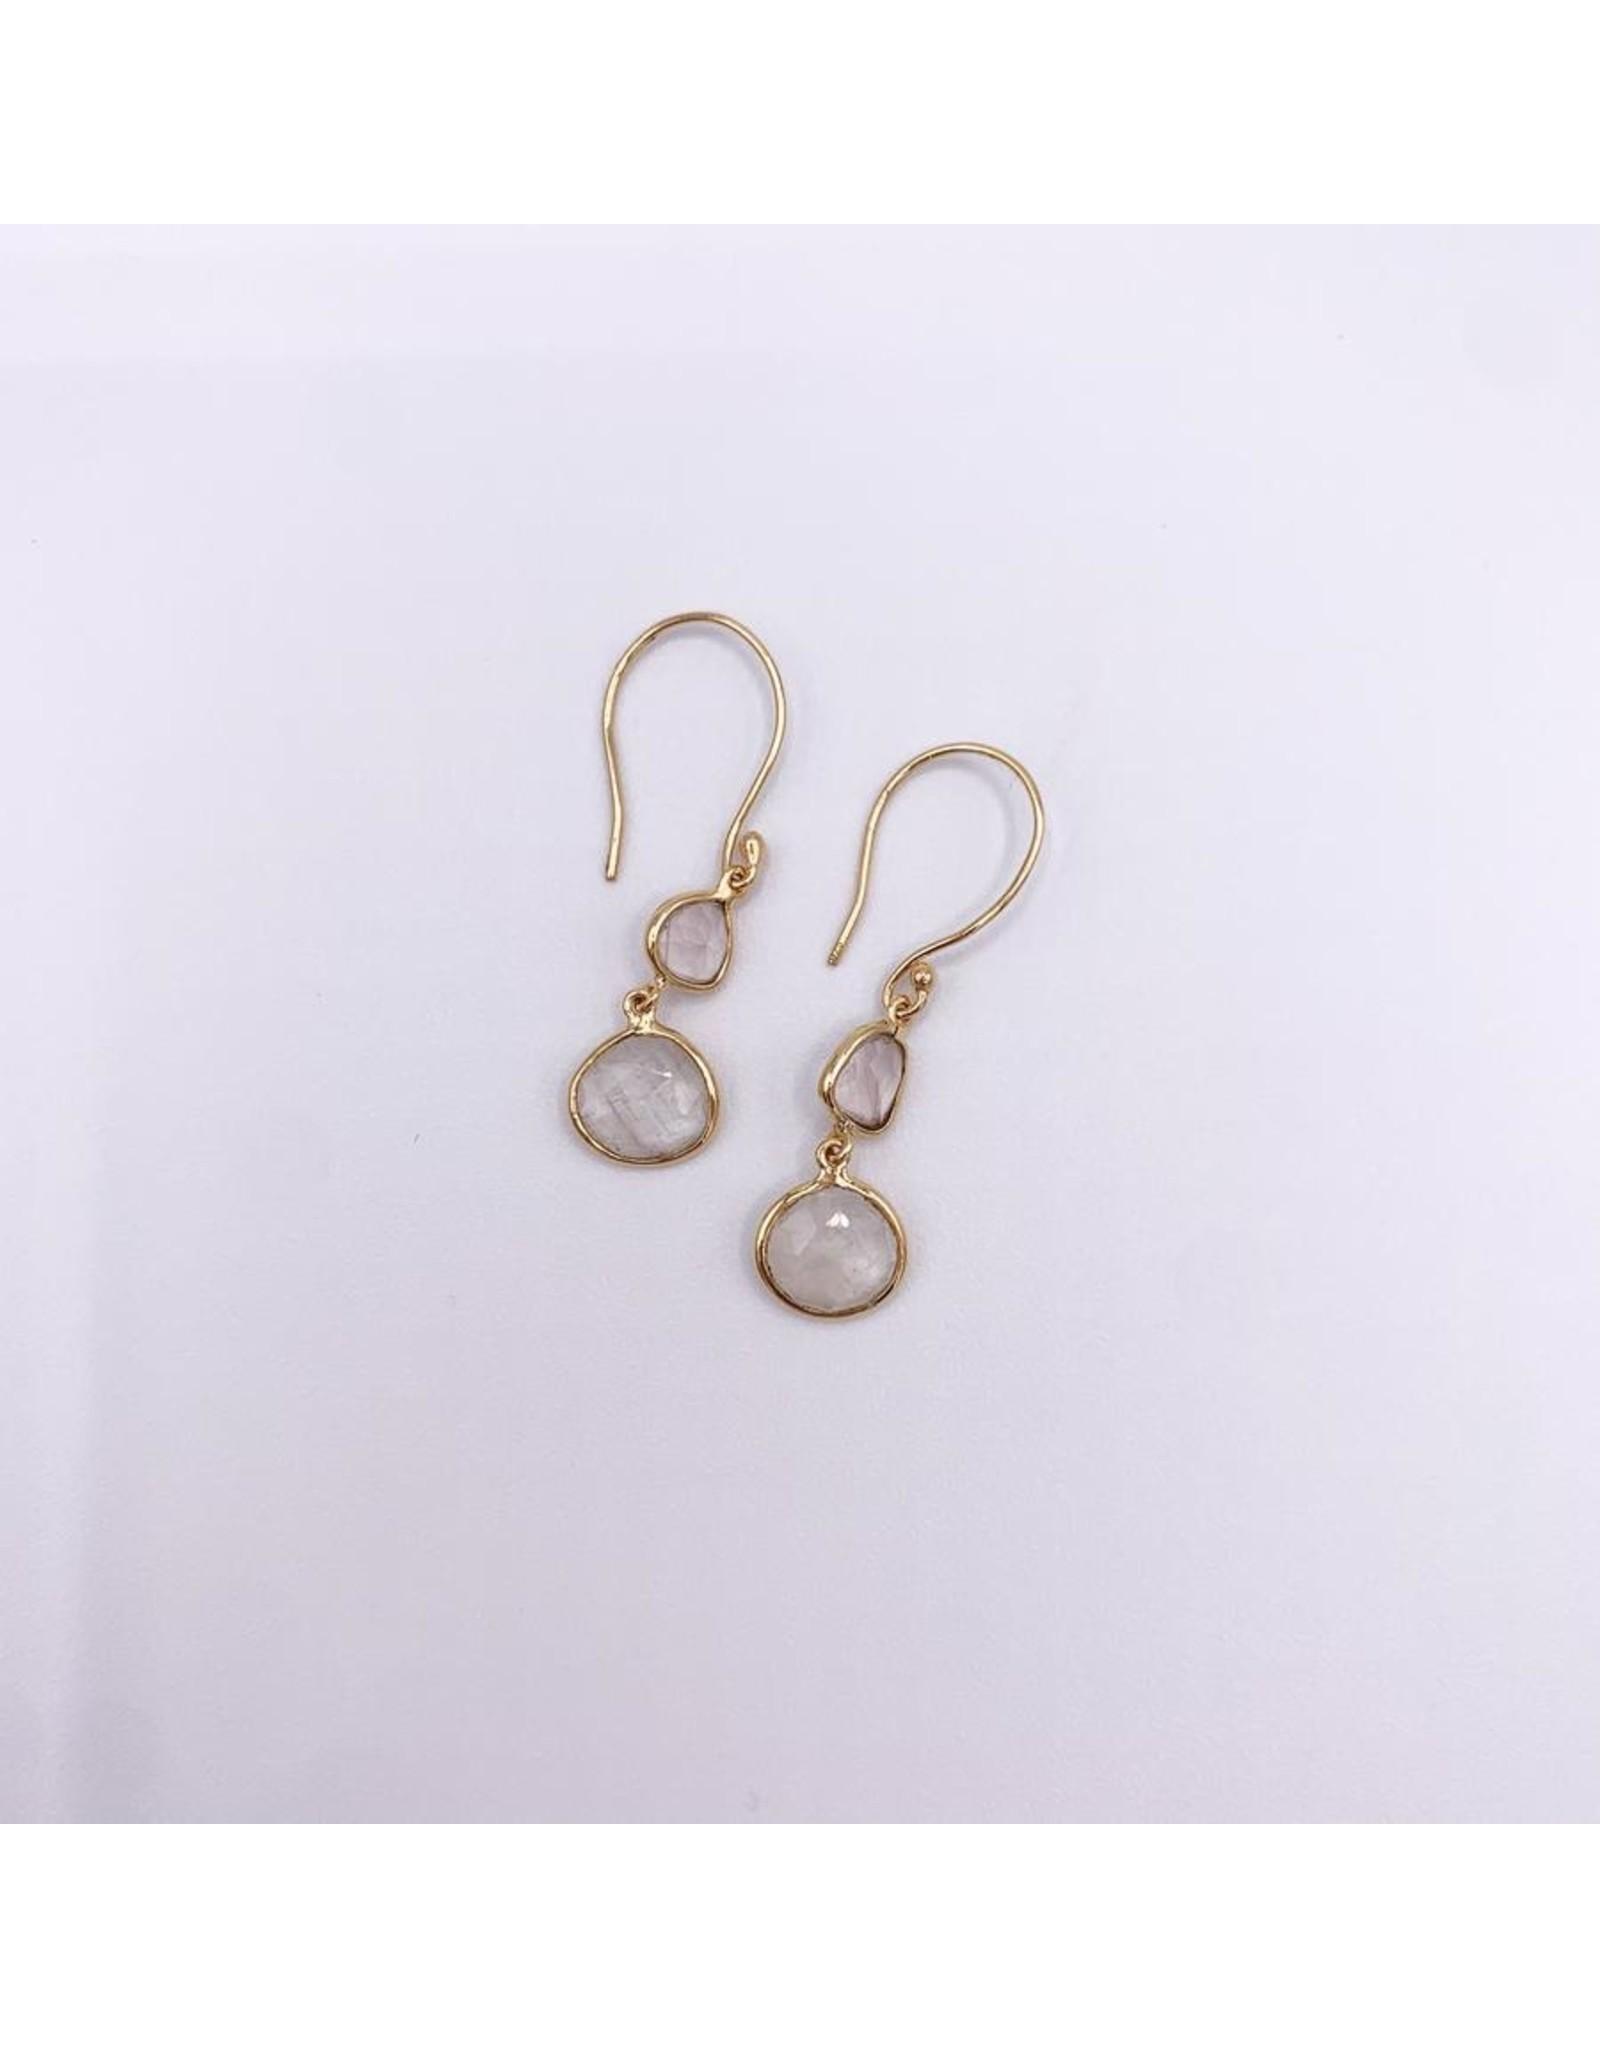 Jewelry By Amanda Gold Jacey Earrings